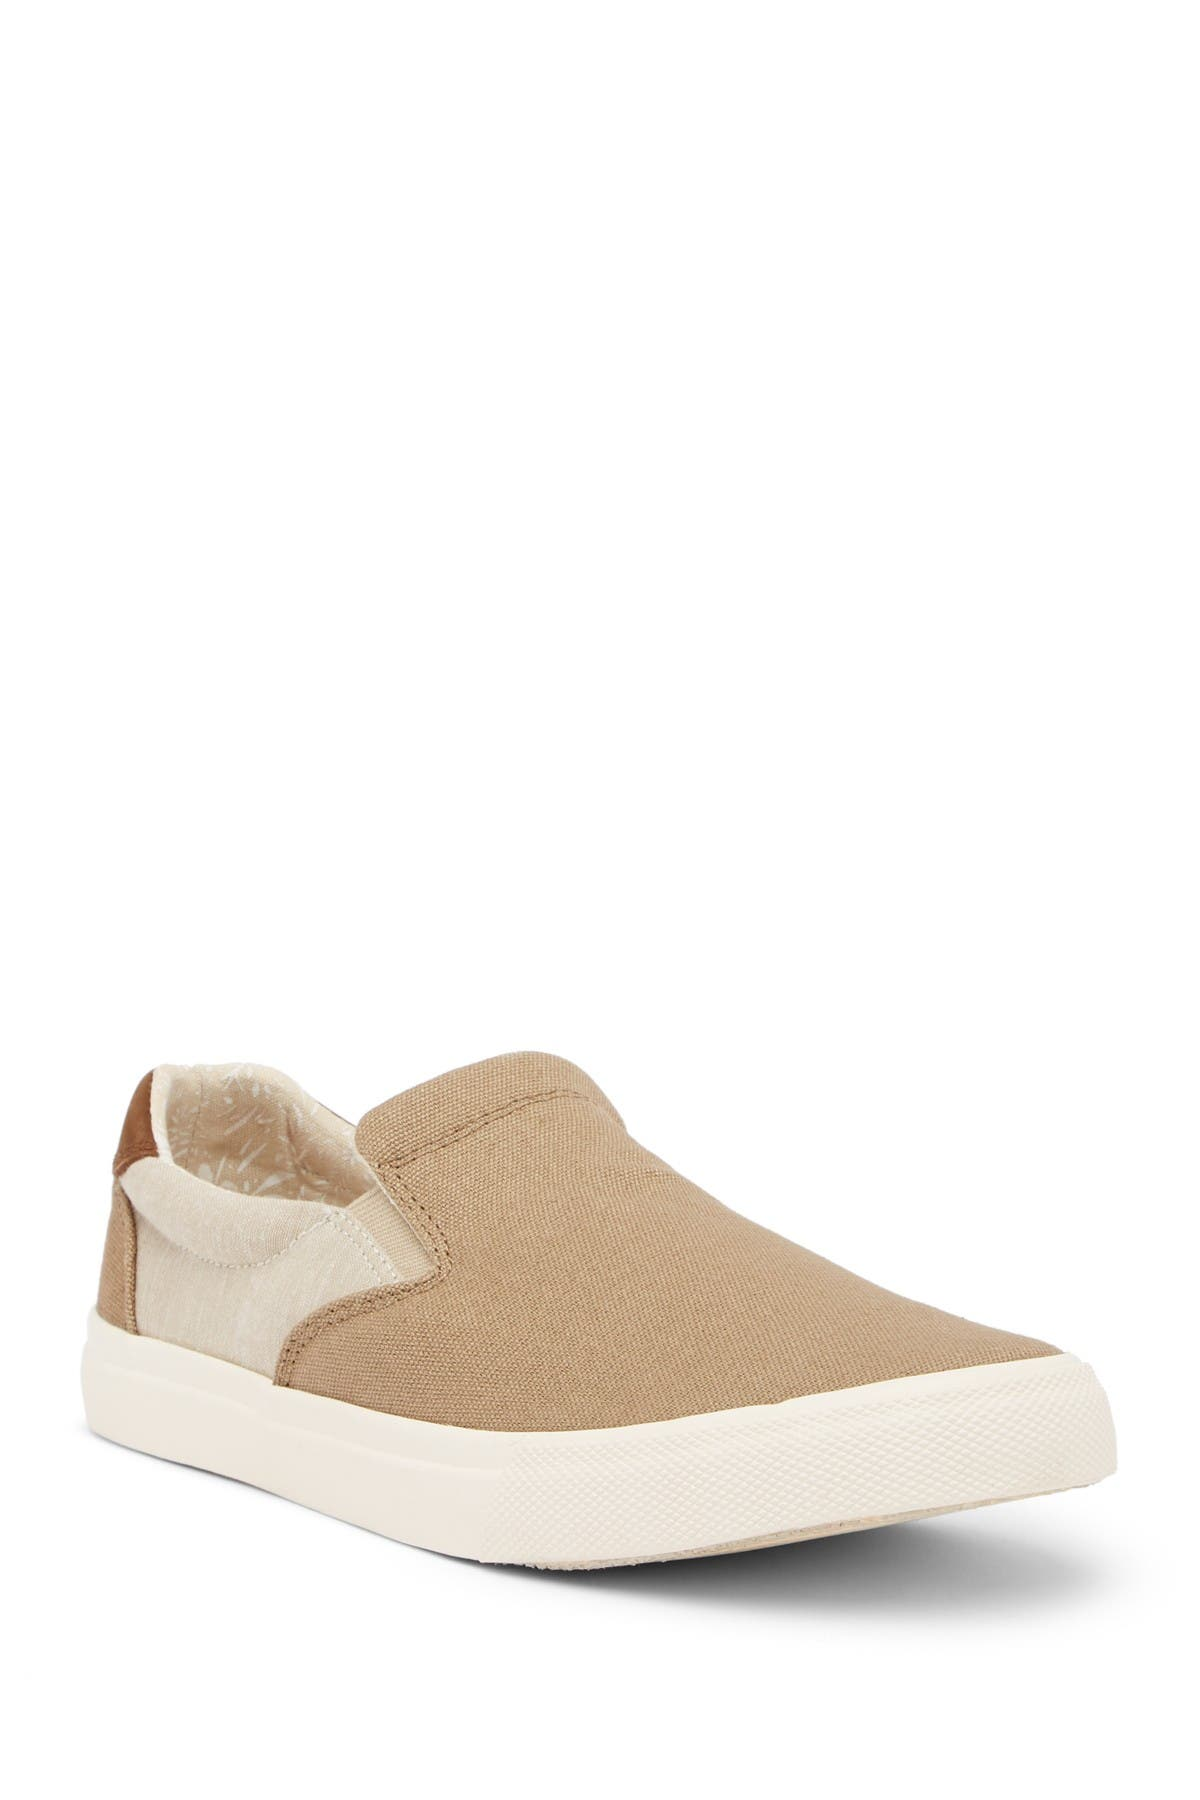 Image of Crevo Baldwin Slip-On Sneaker